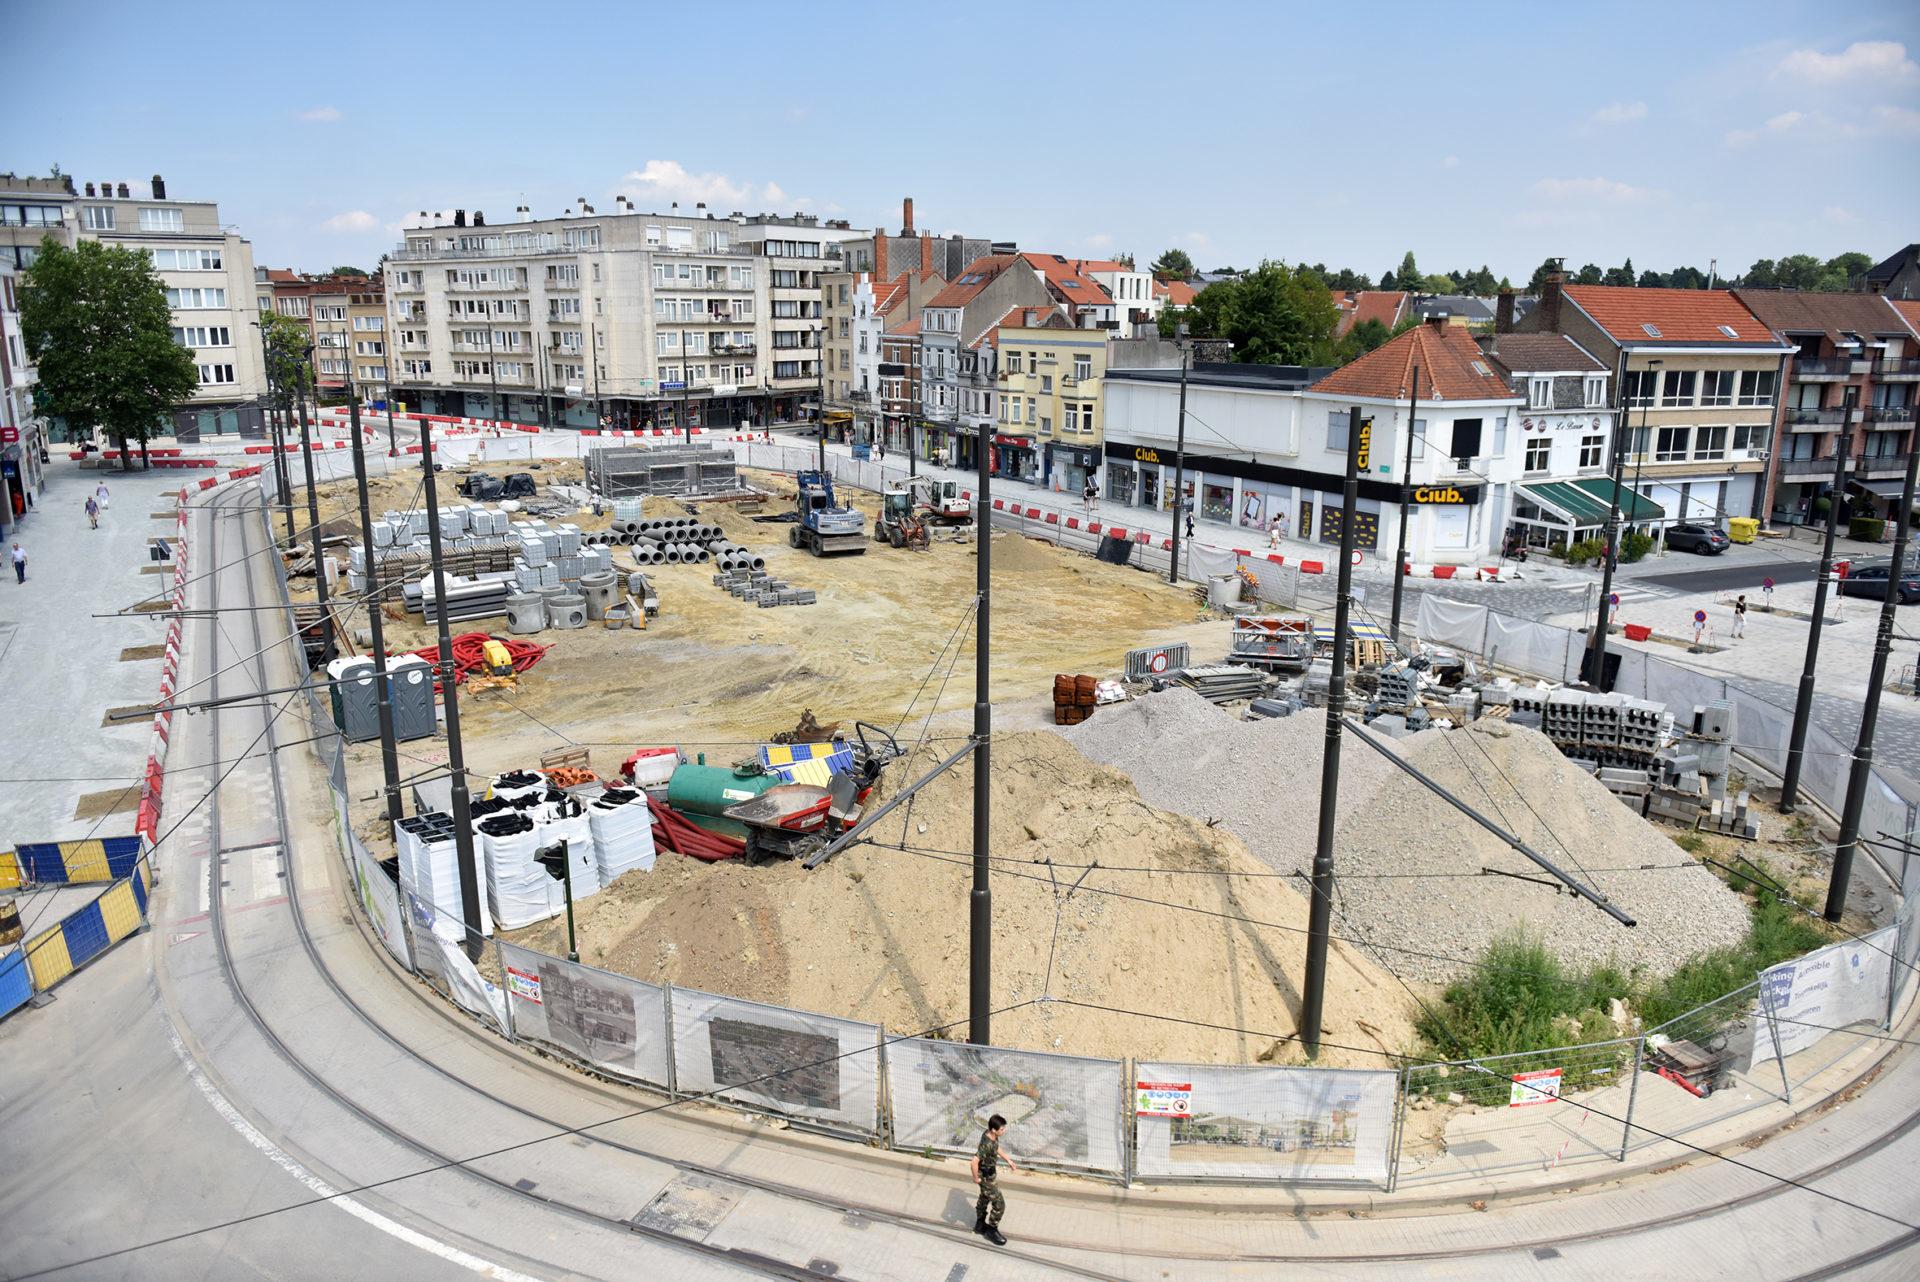 Place Dumon Dumonplein 3